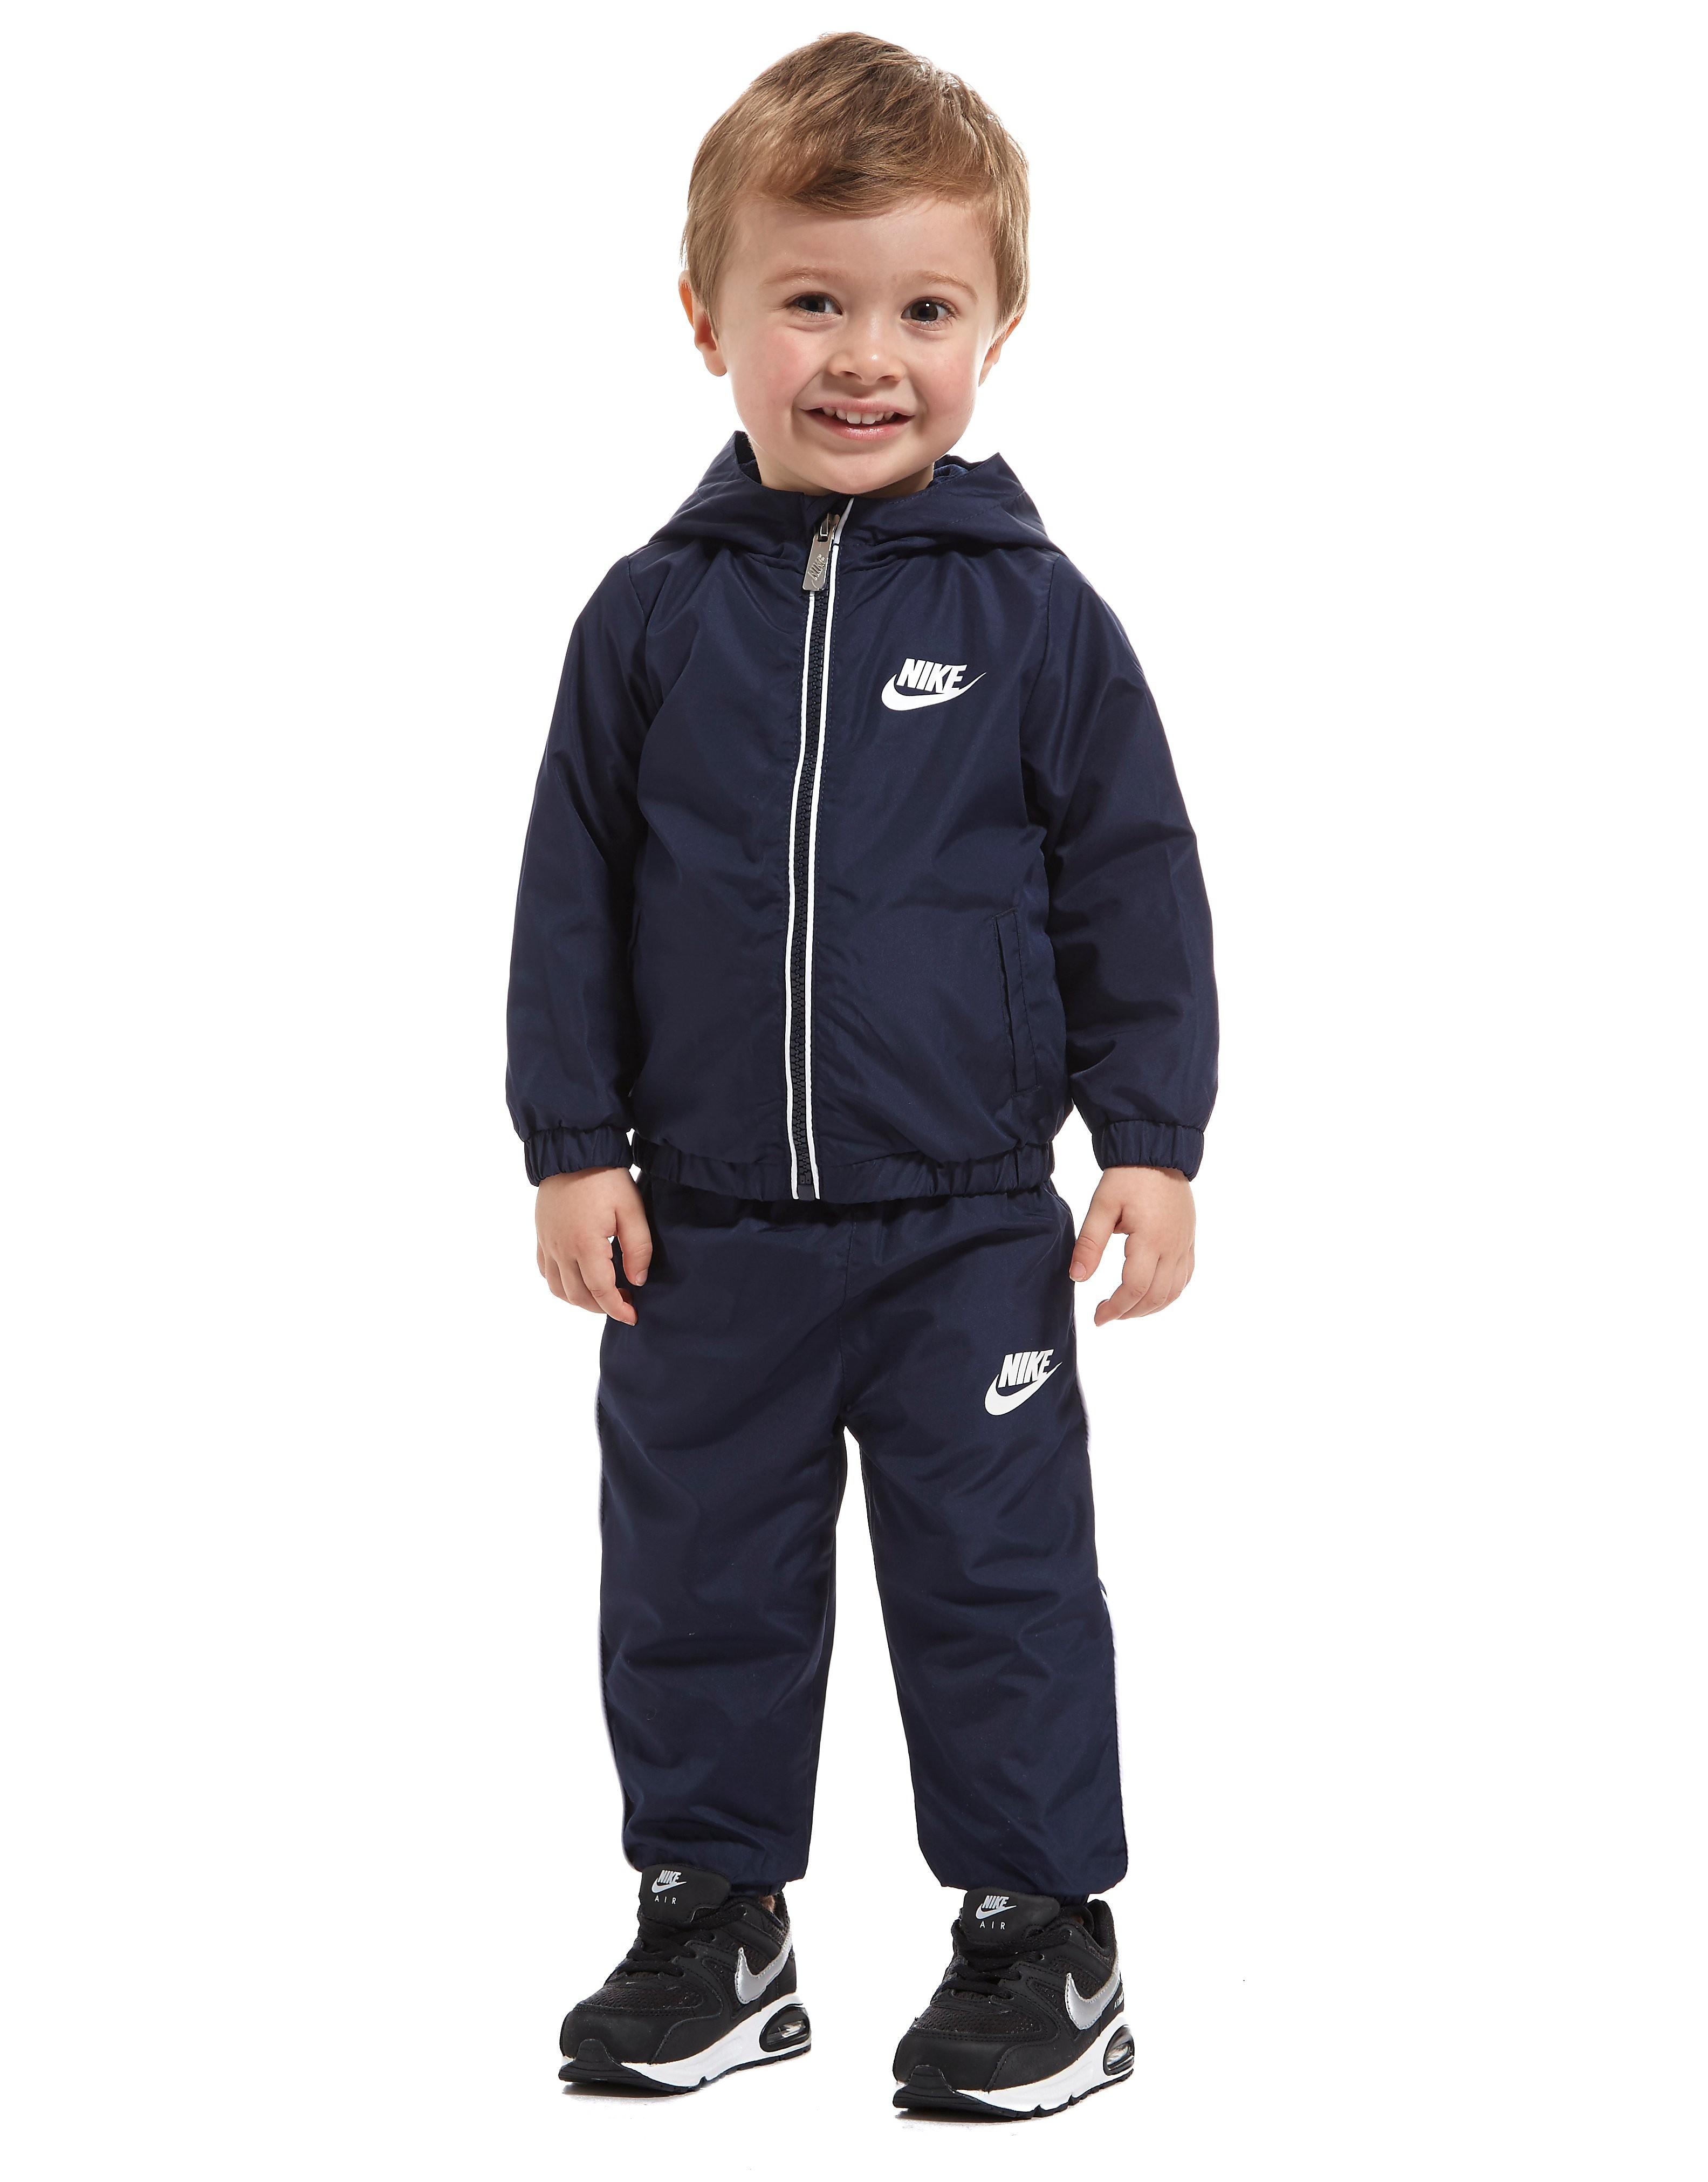 Nike Shutout Suit Baby's